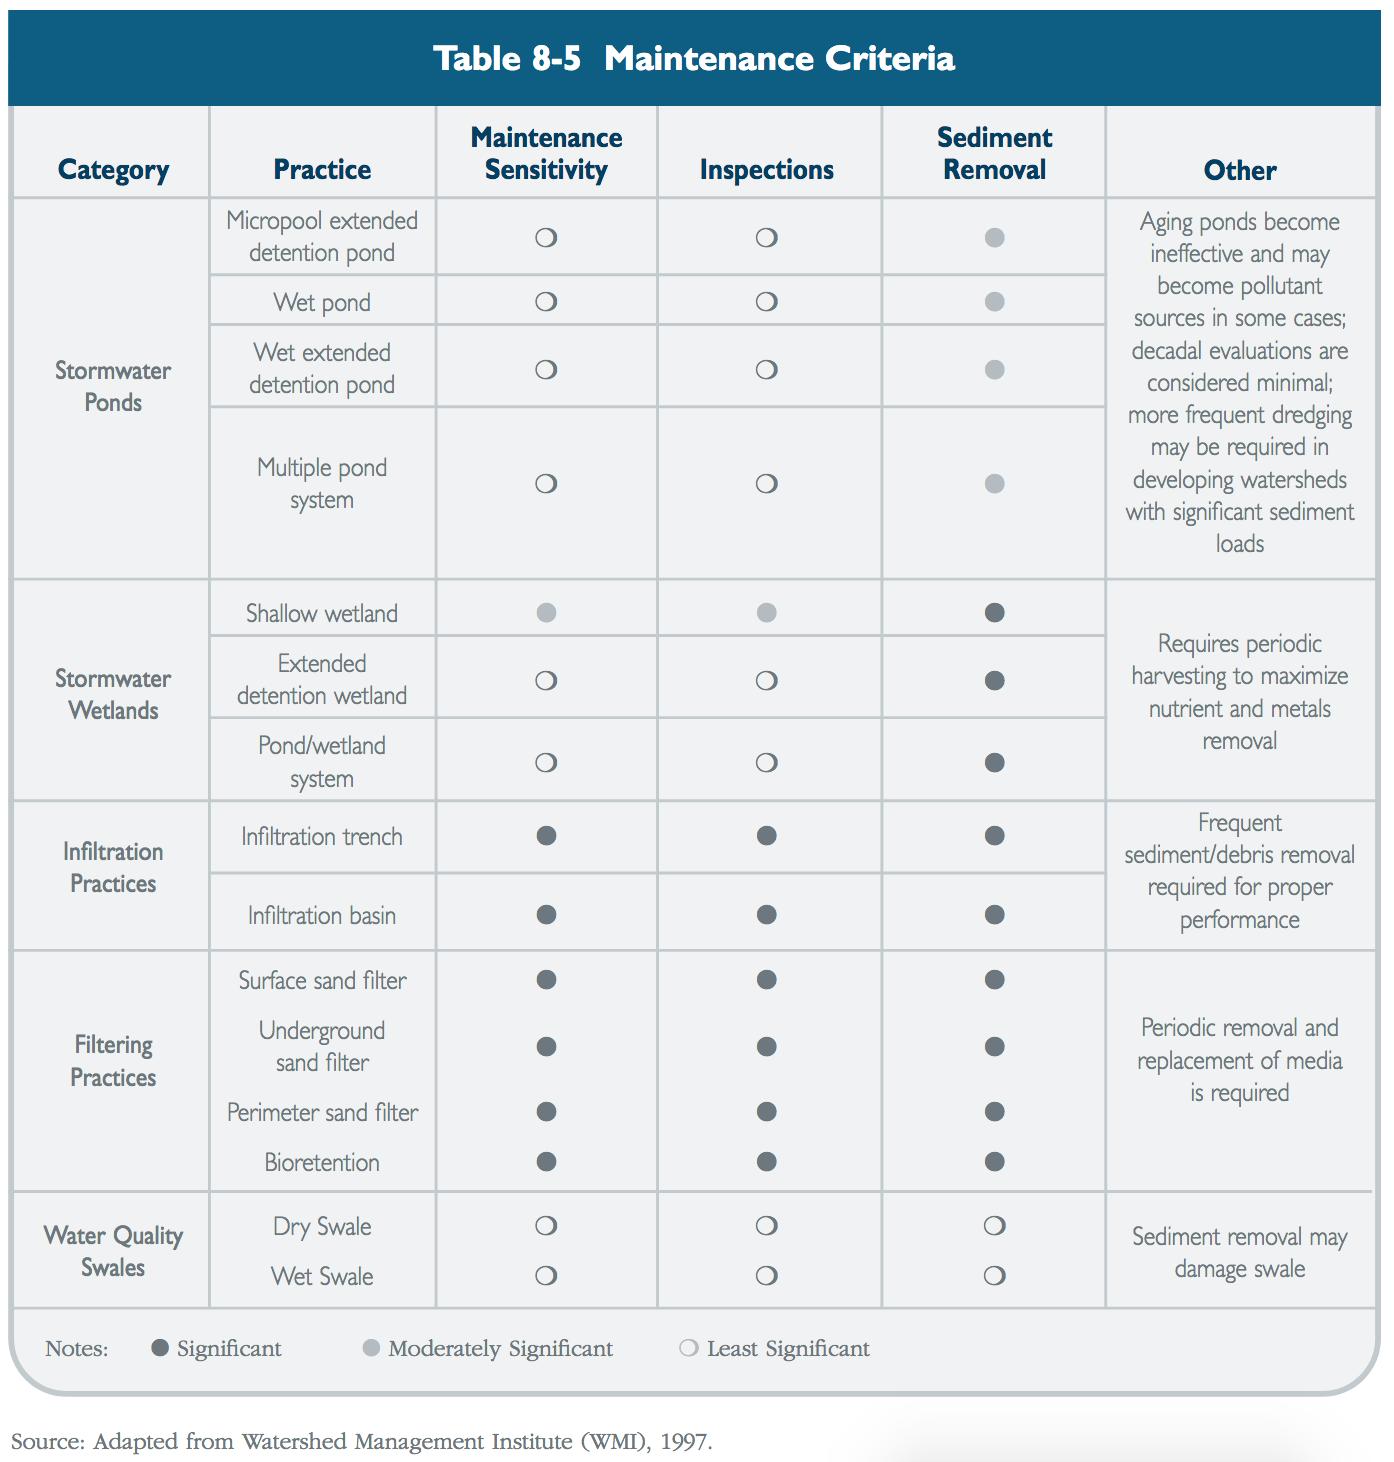 Table 8-5 Maintenance Criteria